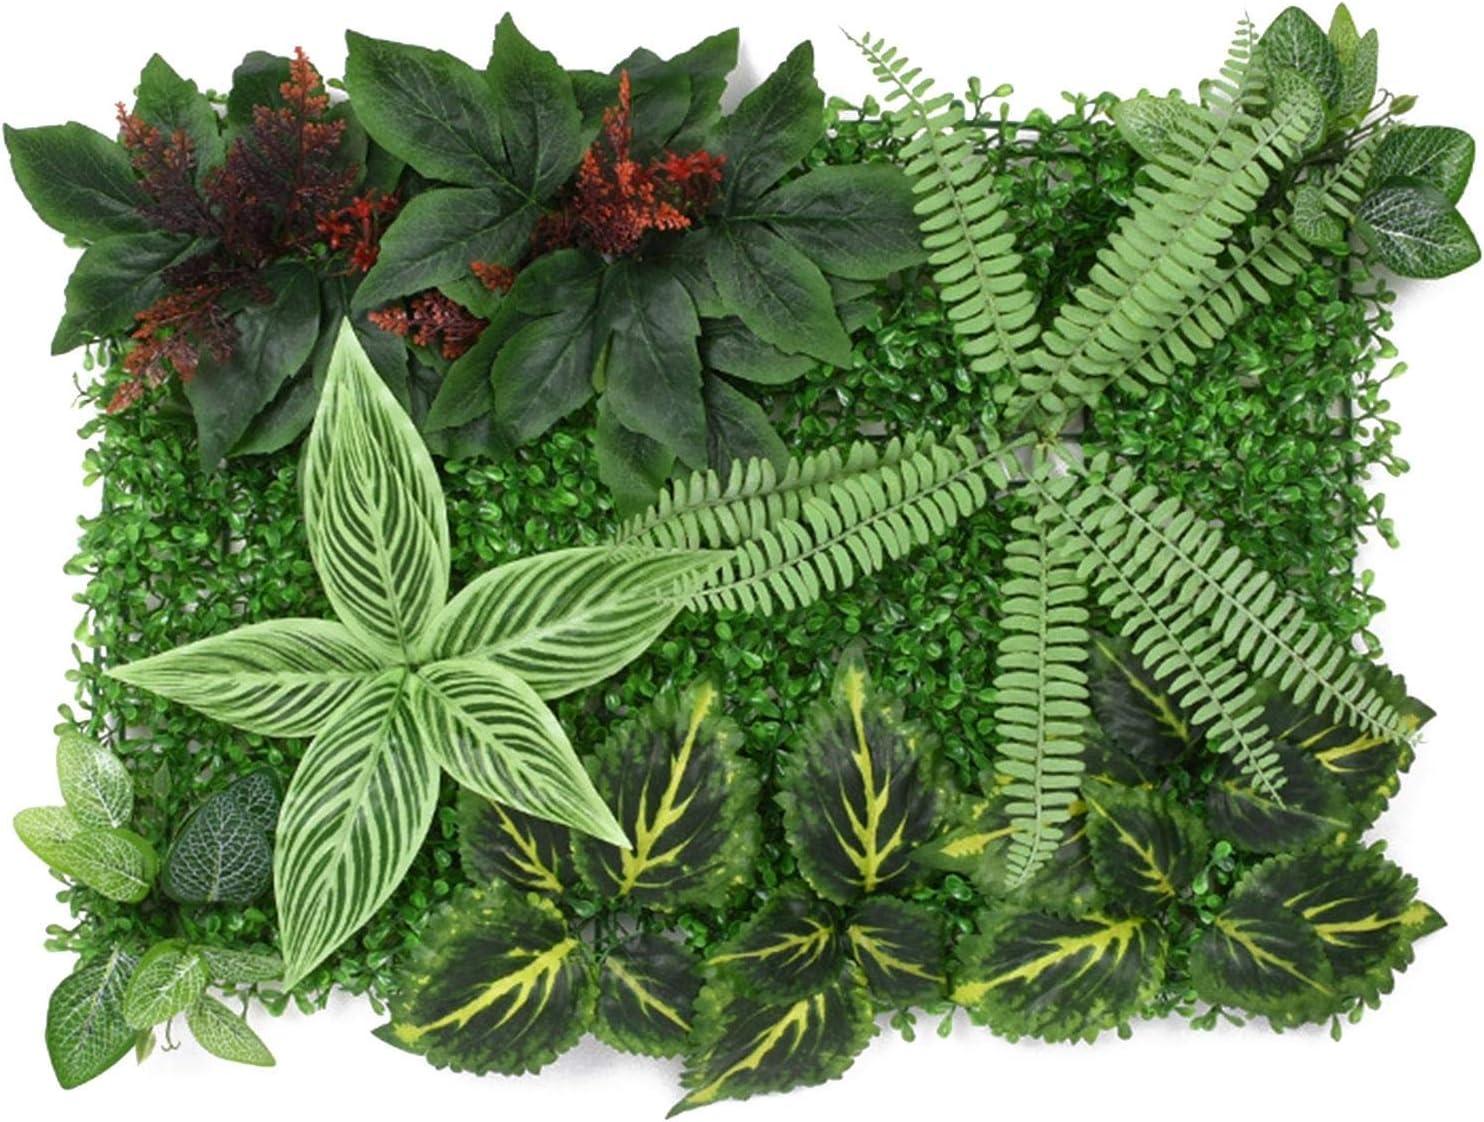 Artificial Plants Panels Plant Privacy Decor Screen Hedge Atlanta Mall Garden Genuine